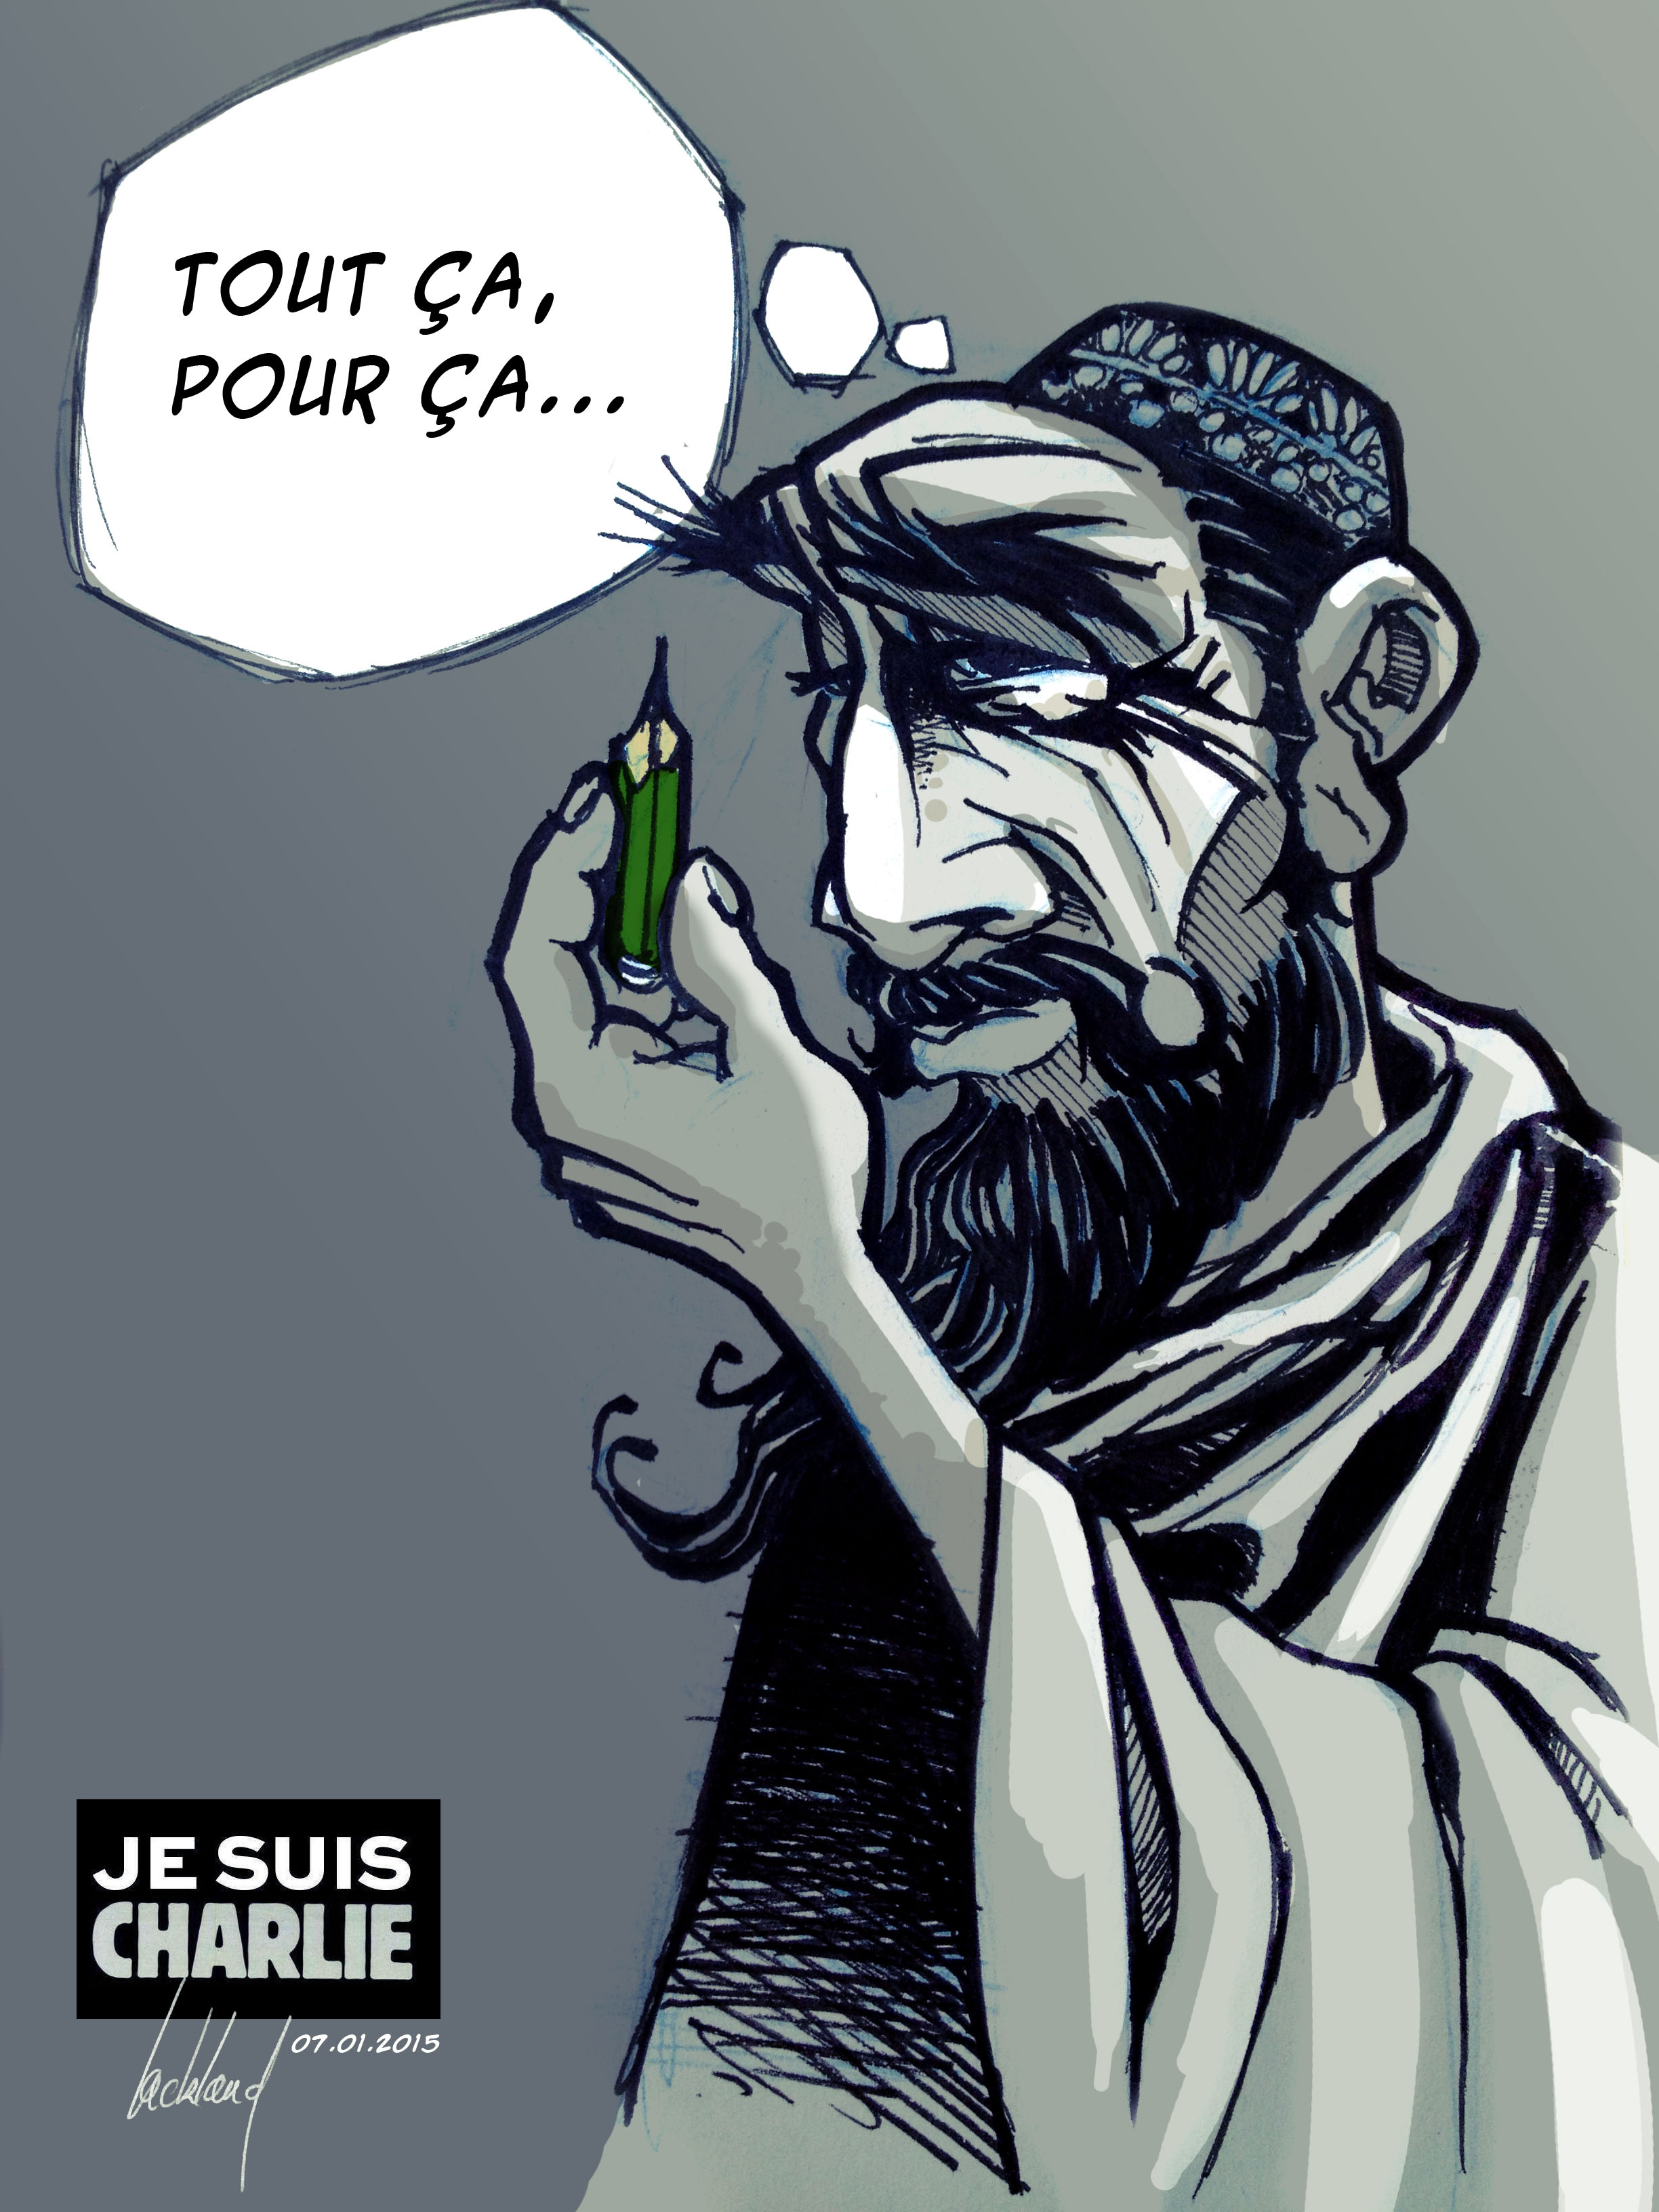 eYeka JeSuisCharlie - Tout ca pour ca